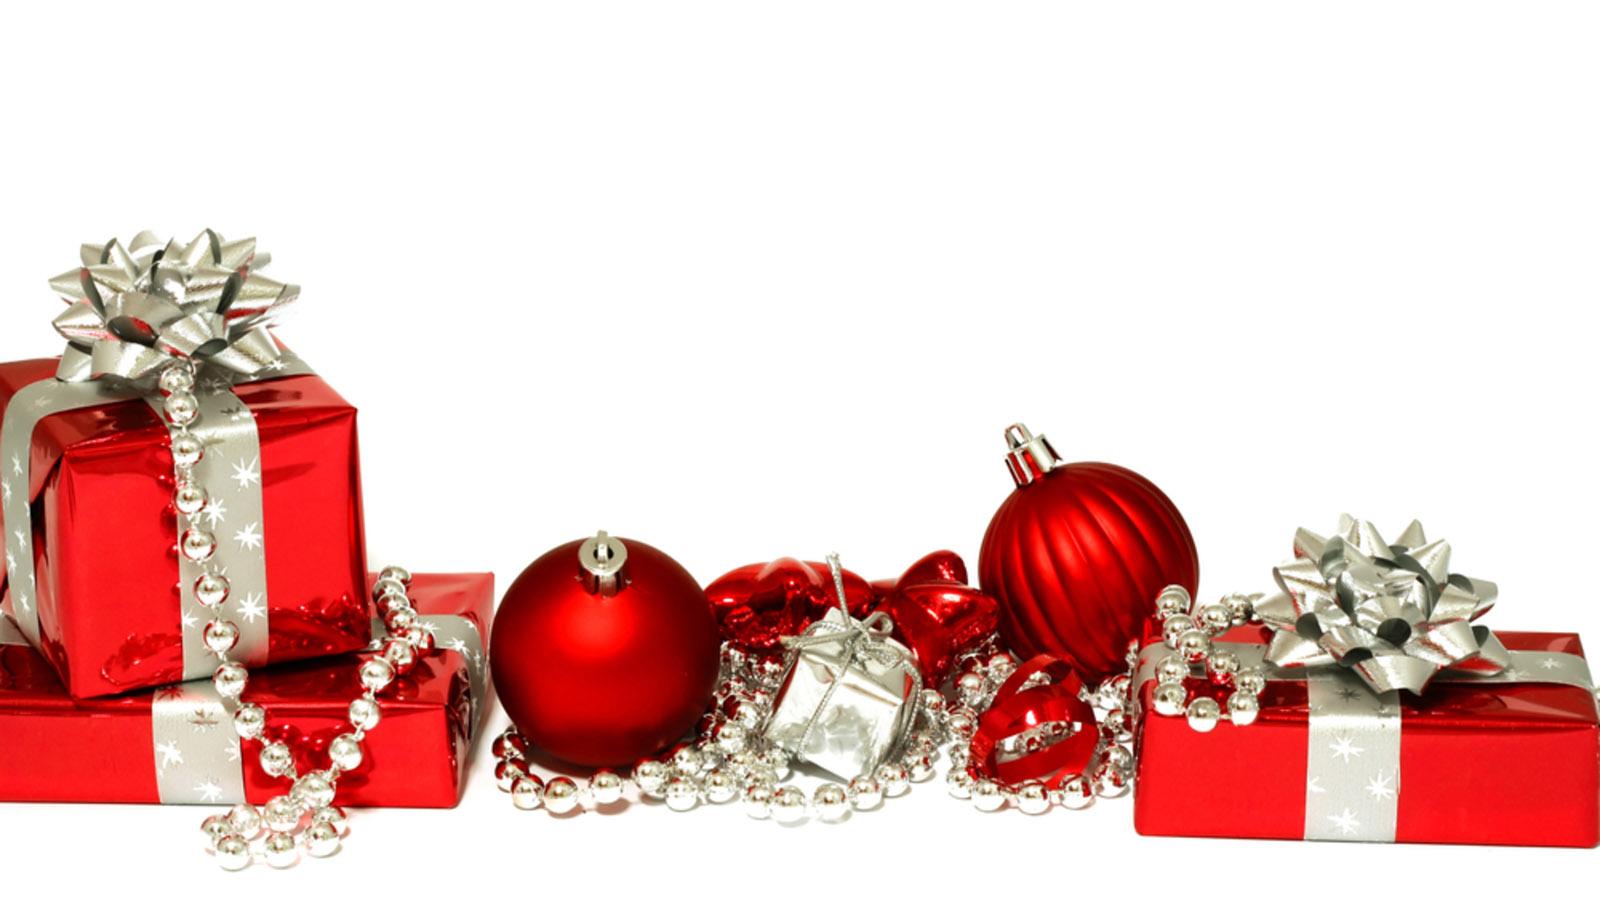 merry christmas hd images - Country Christmas Radio